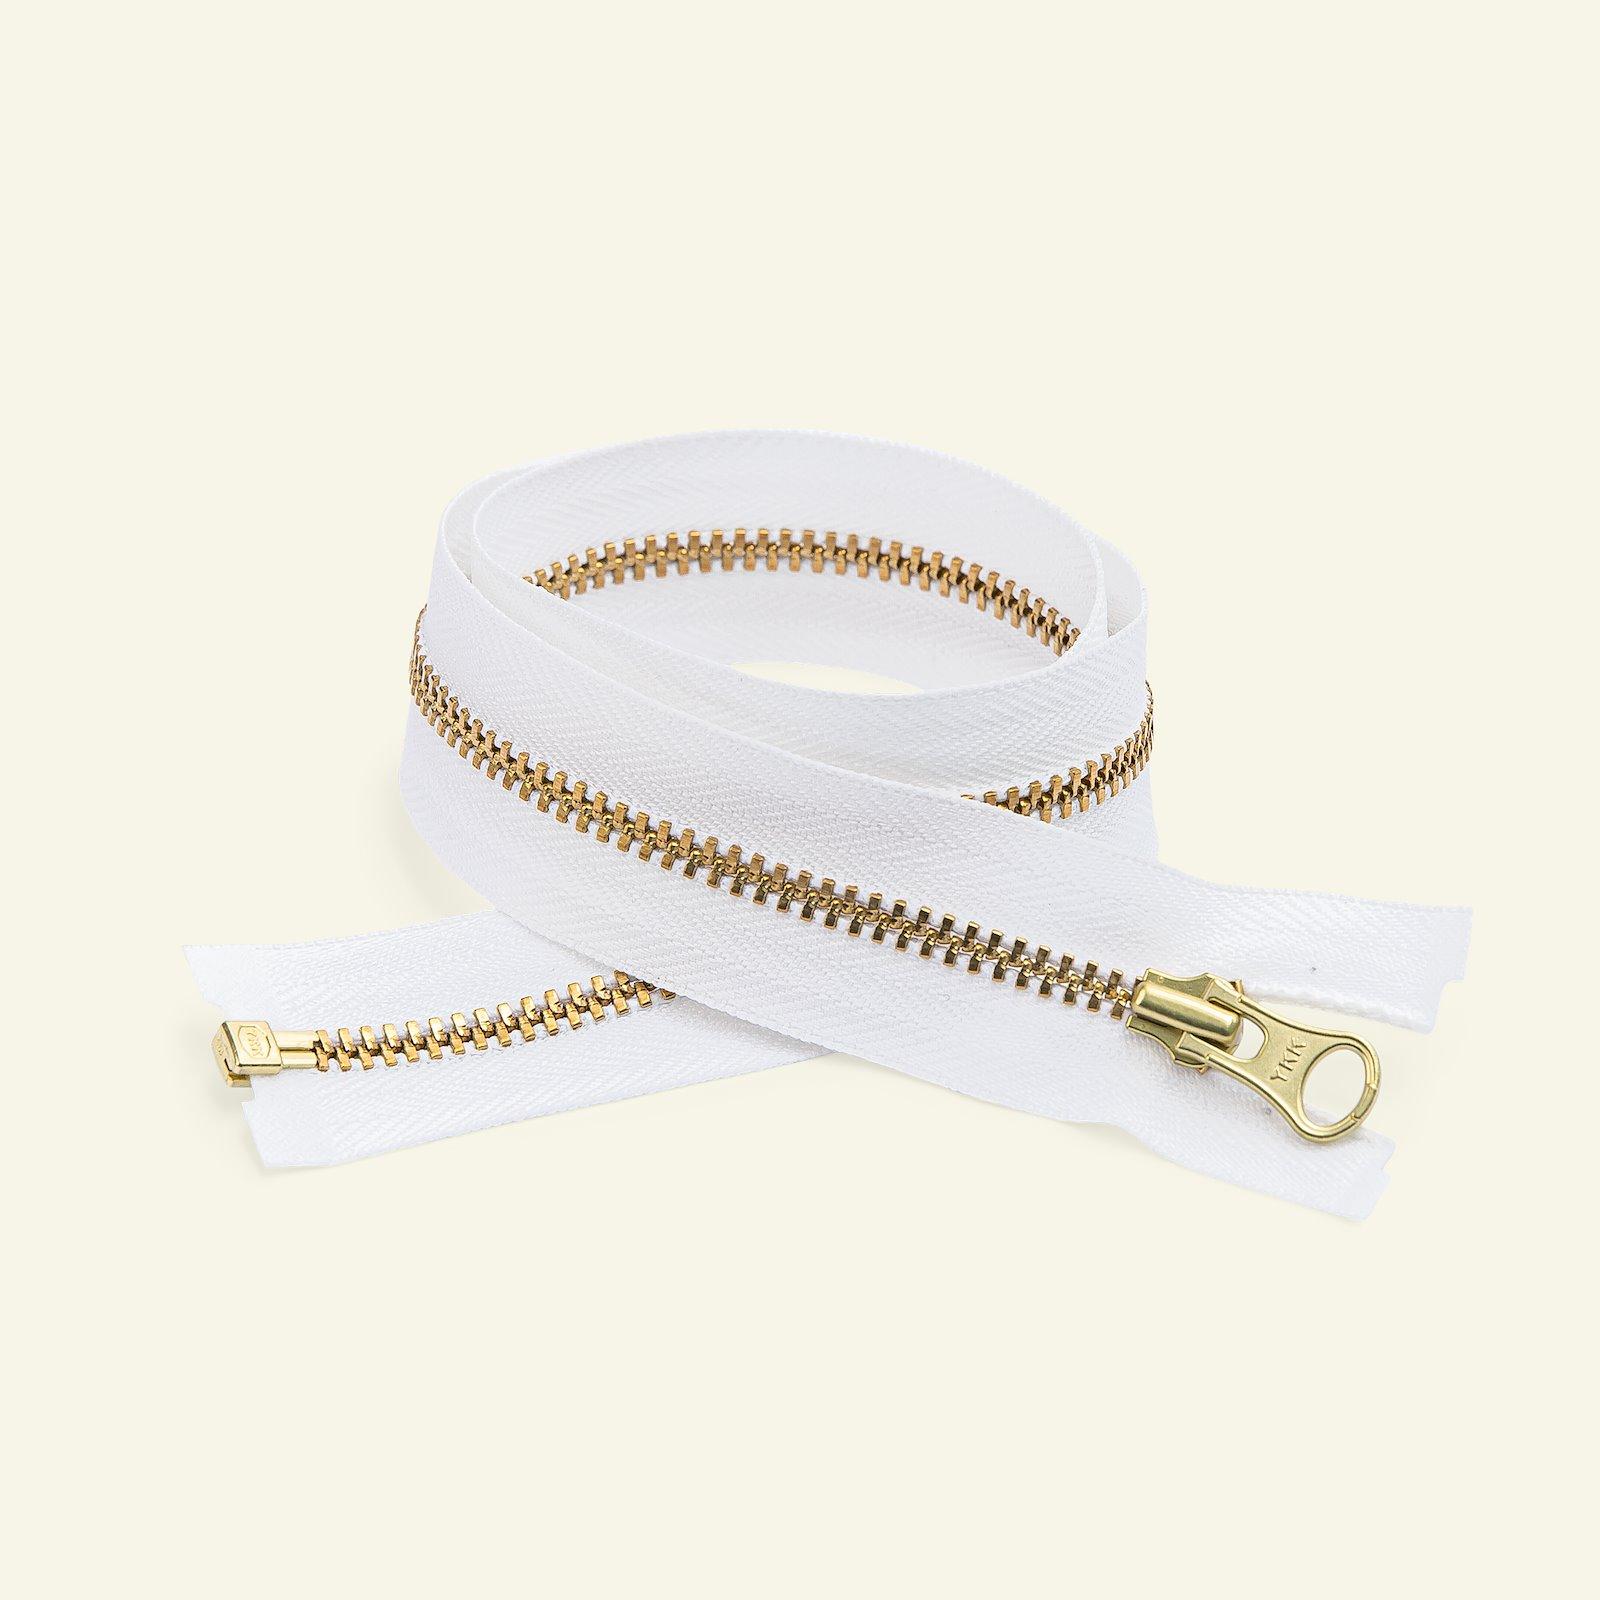 YKK zip 4mm open end 60cm white/gold x59701_pack